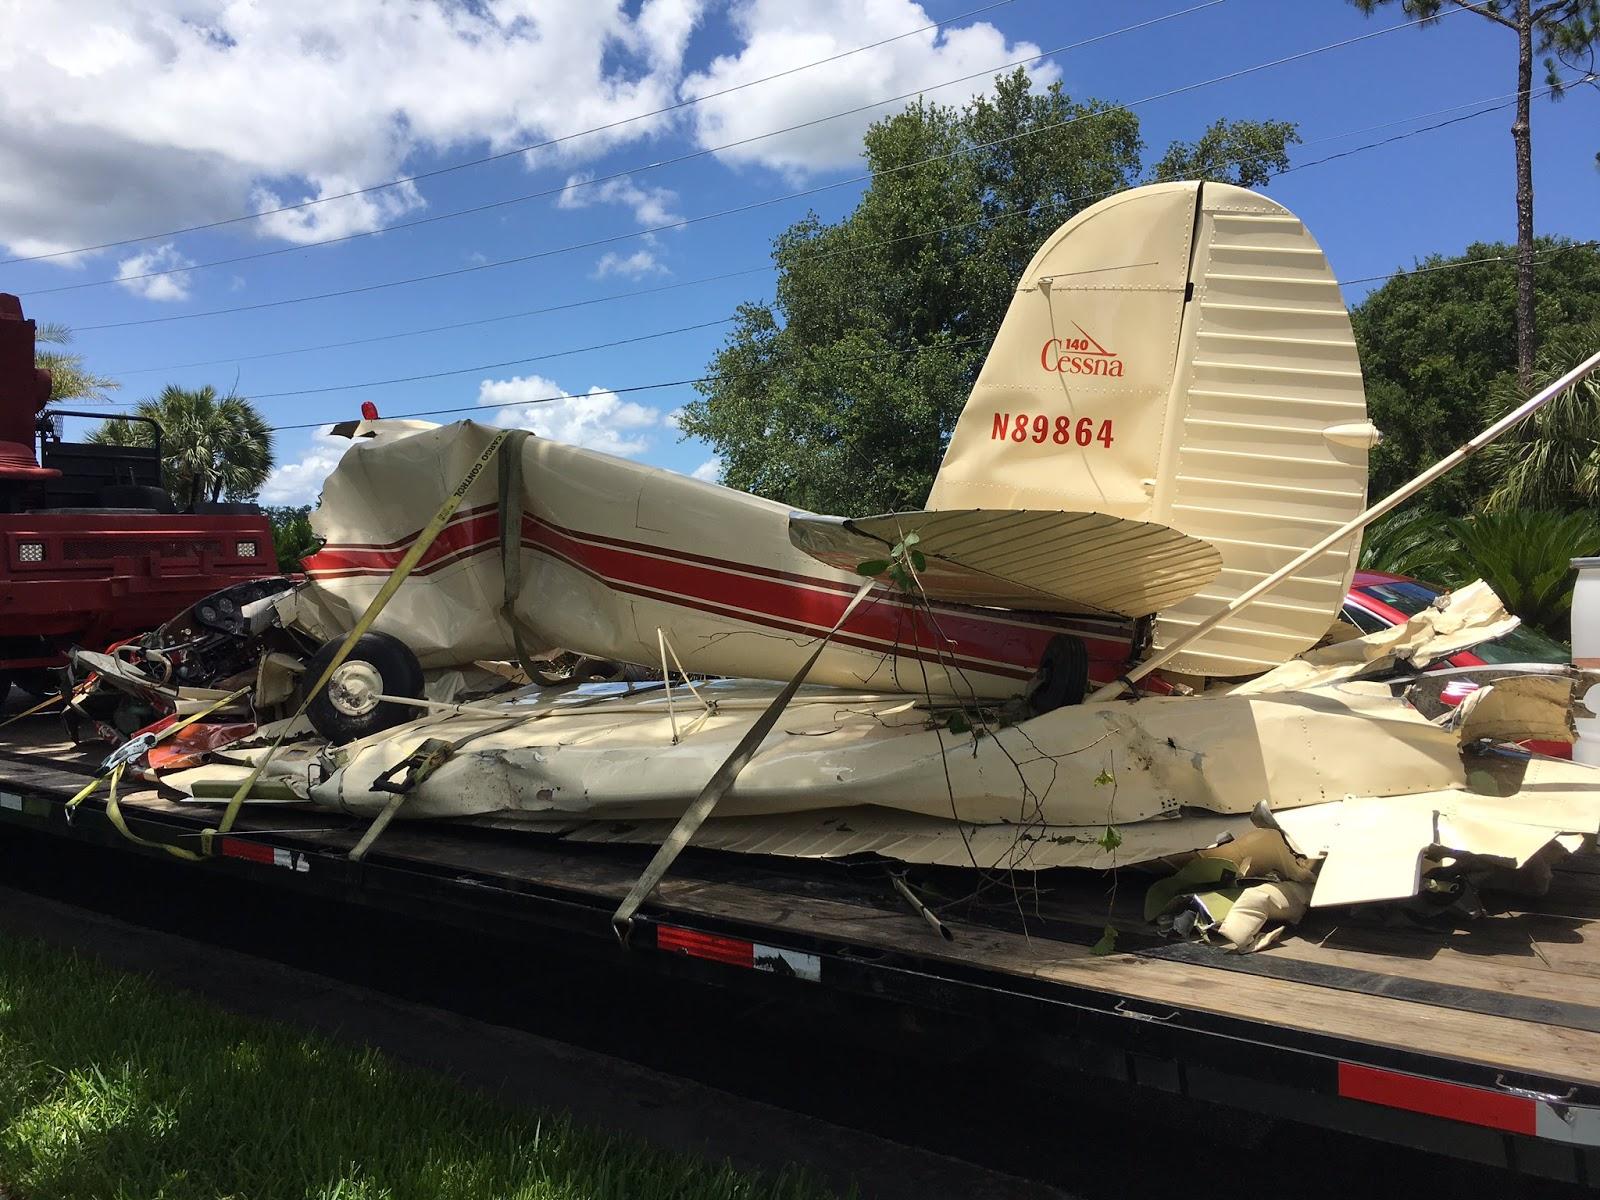 Kathryn's Report: Fuel Starvation: Cessna 140, N89864, fatal